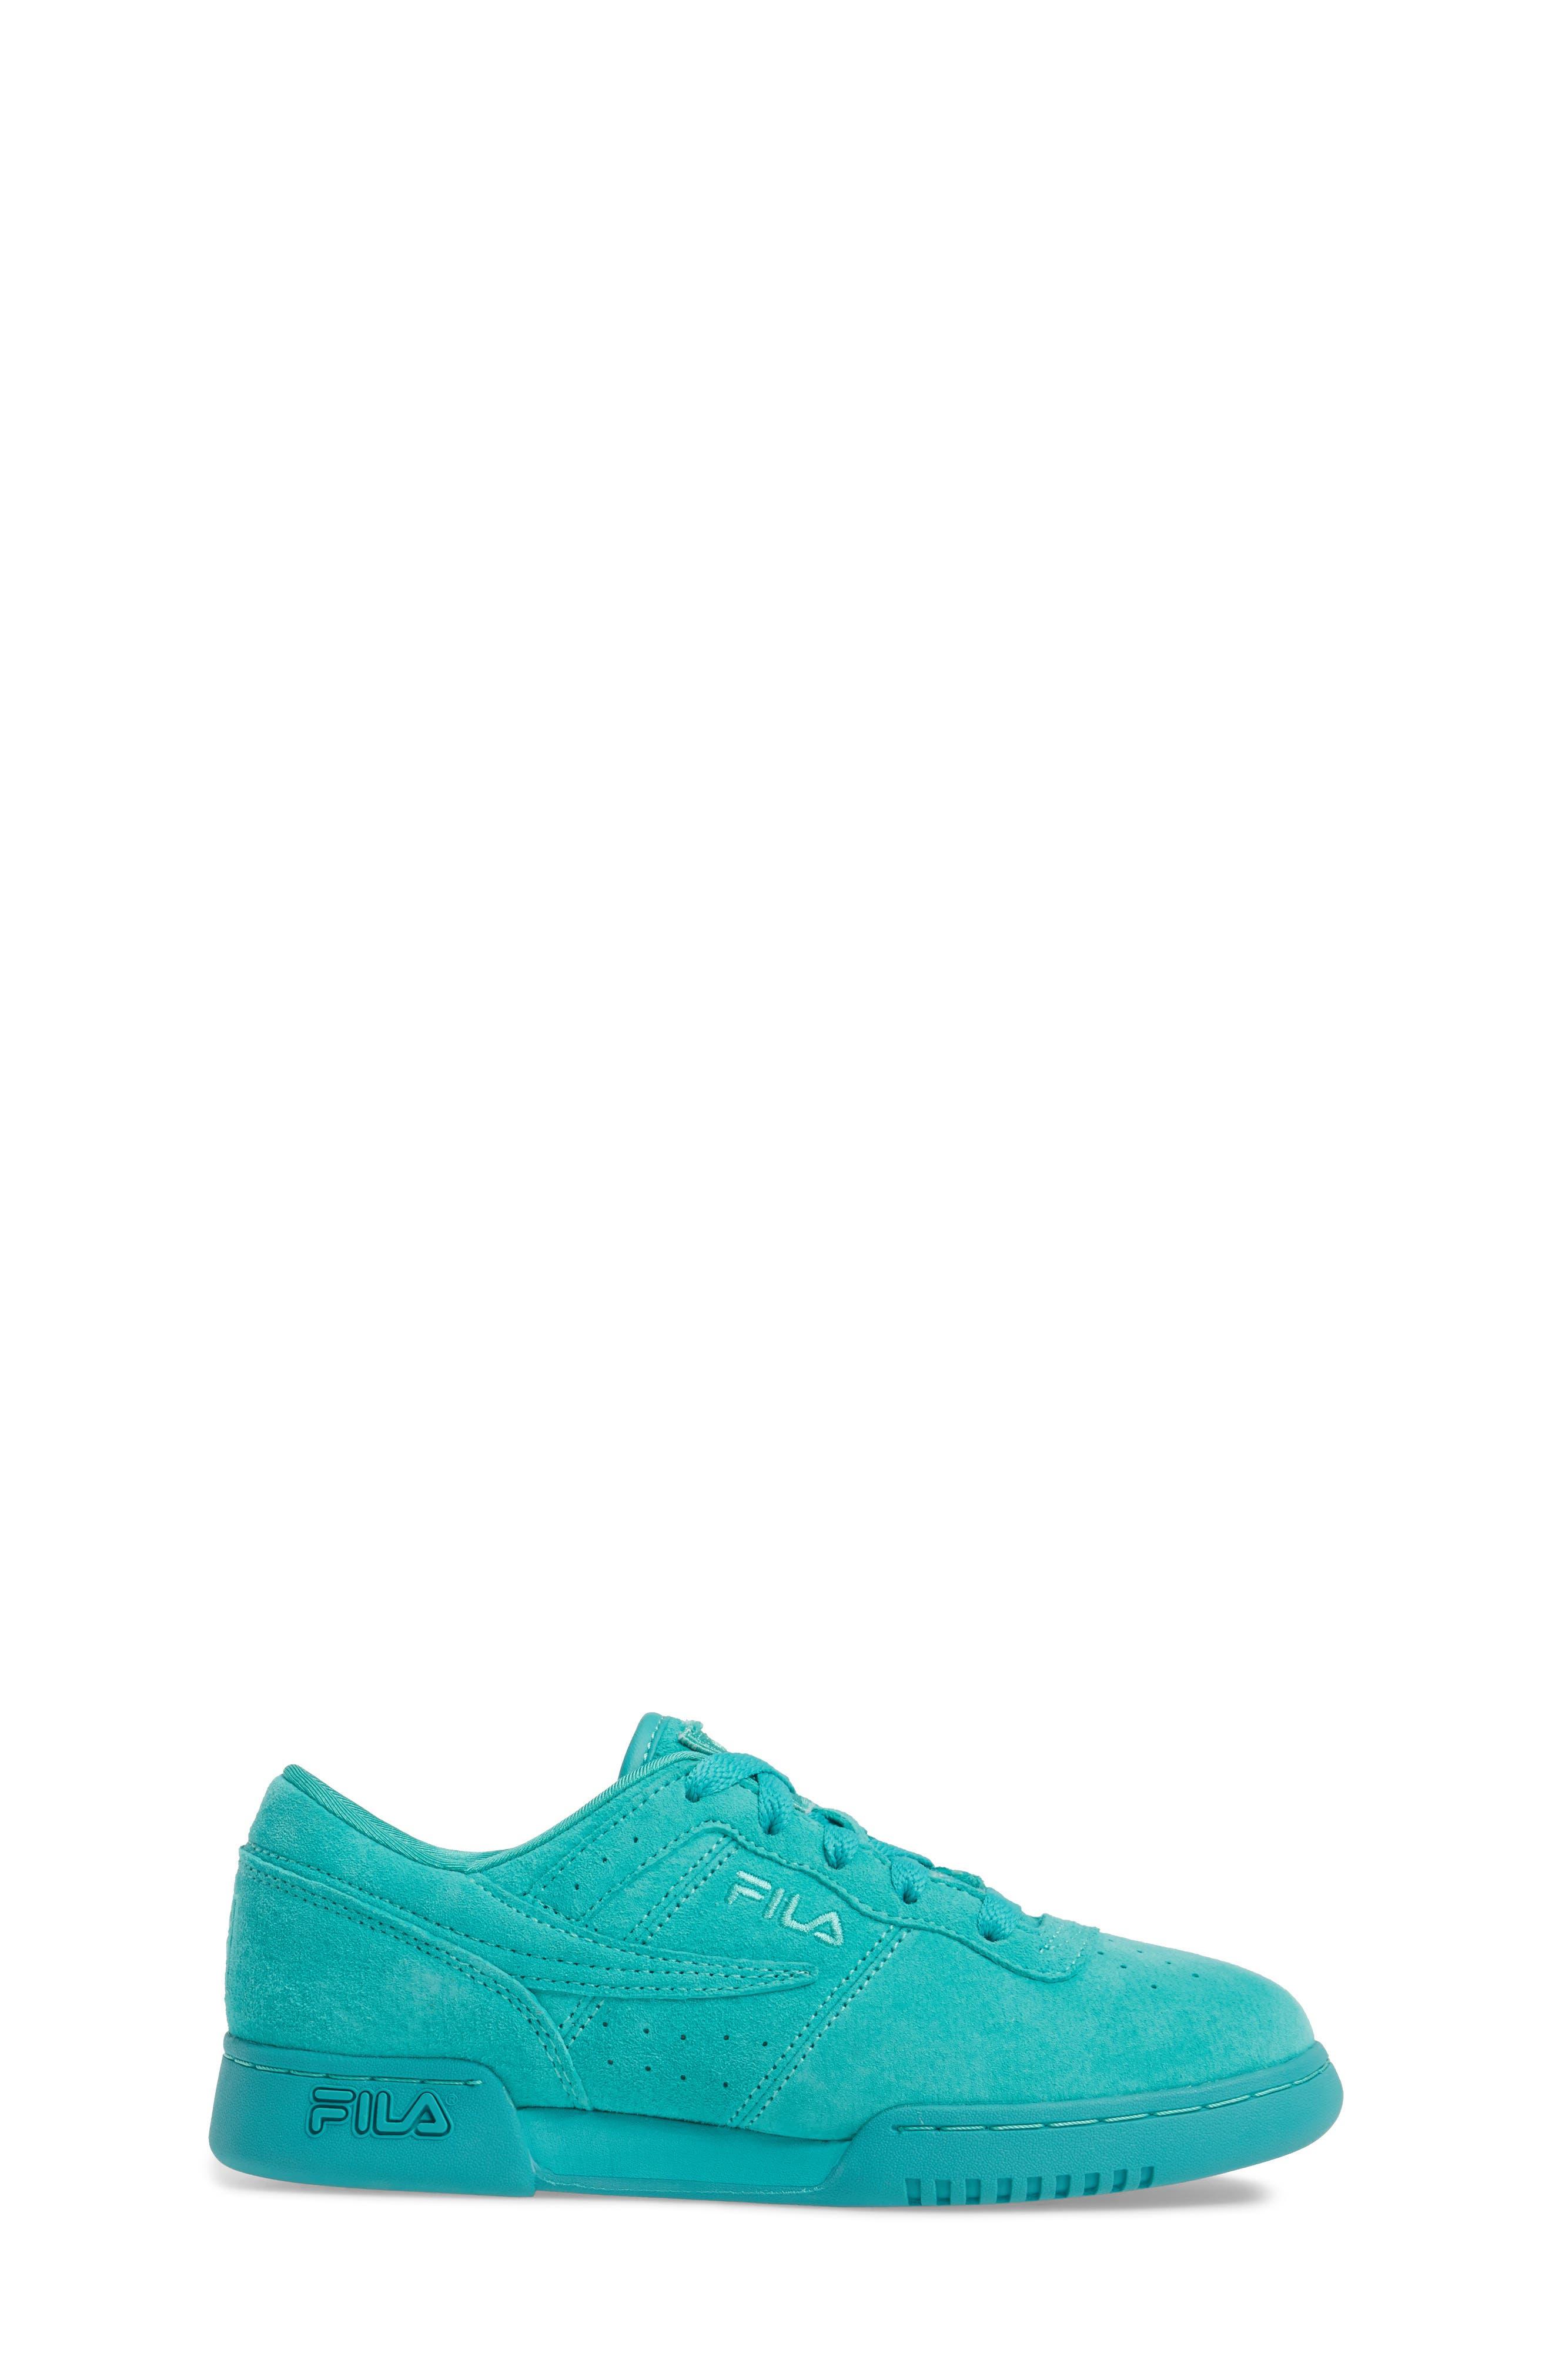 Original Fitness Sneaker,                             Alternate thumbnail 3, color,                             Sea Foam